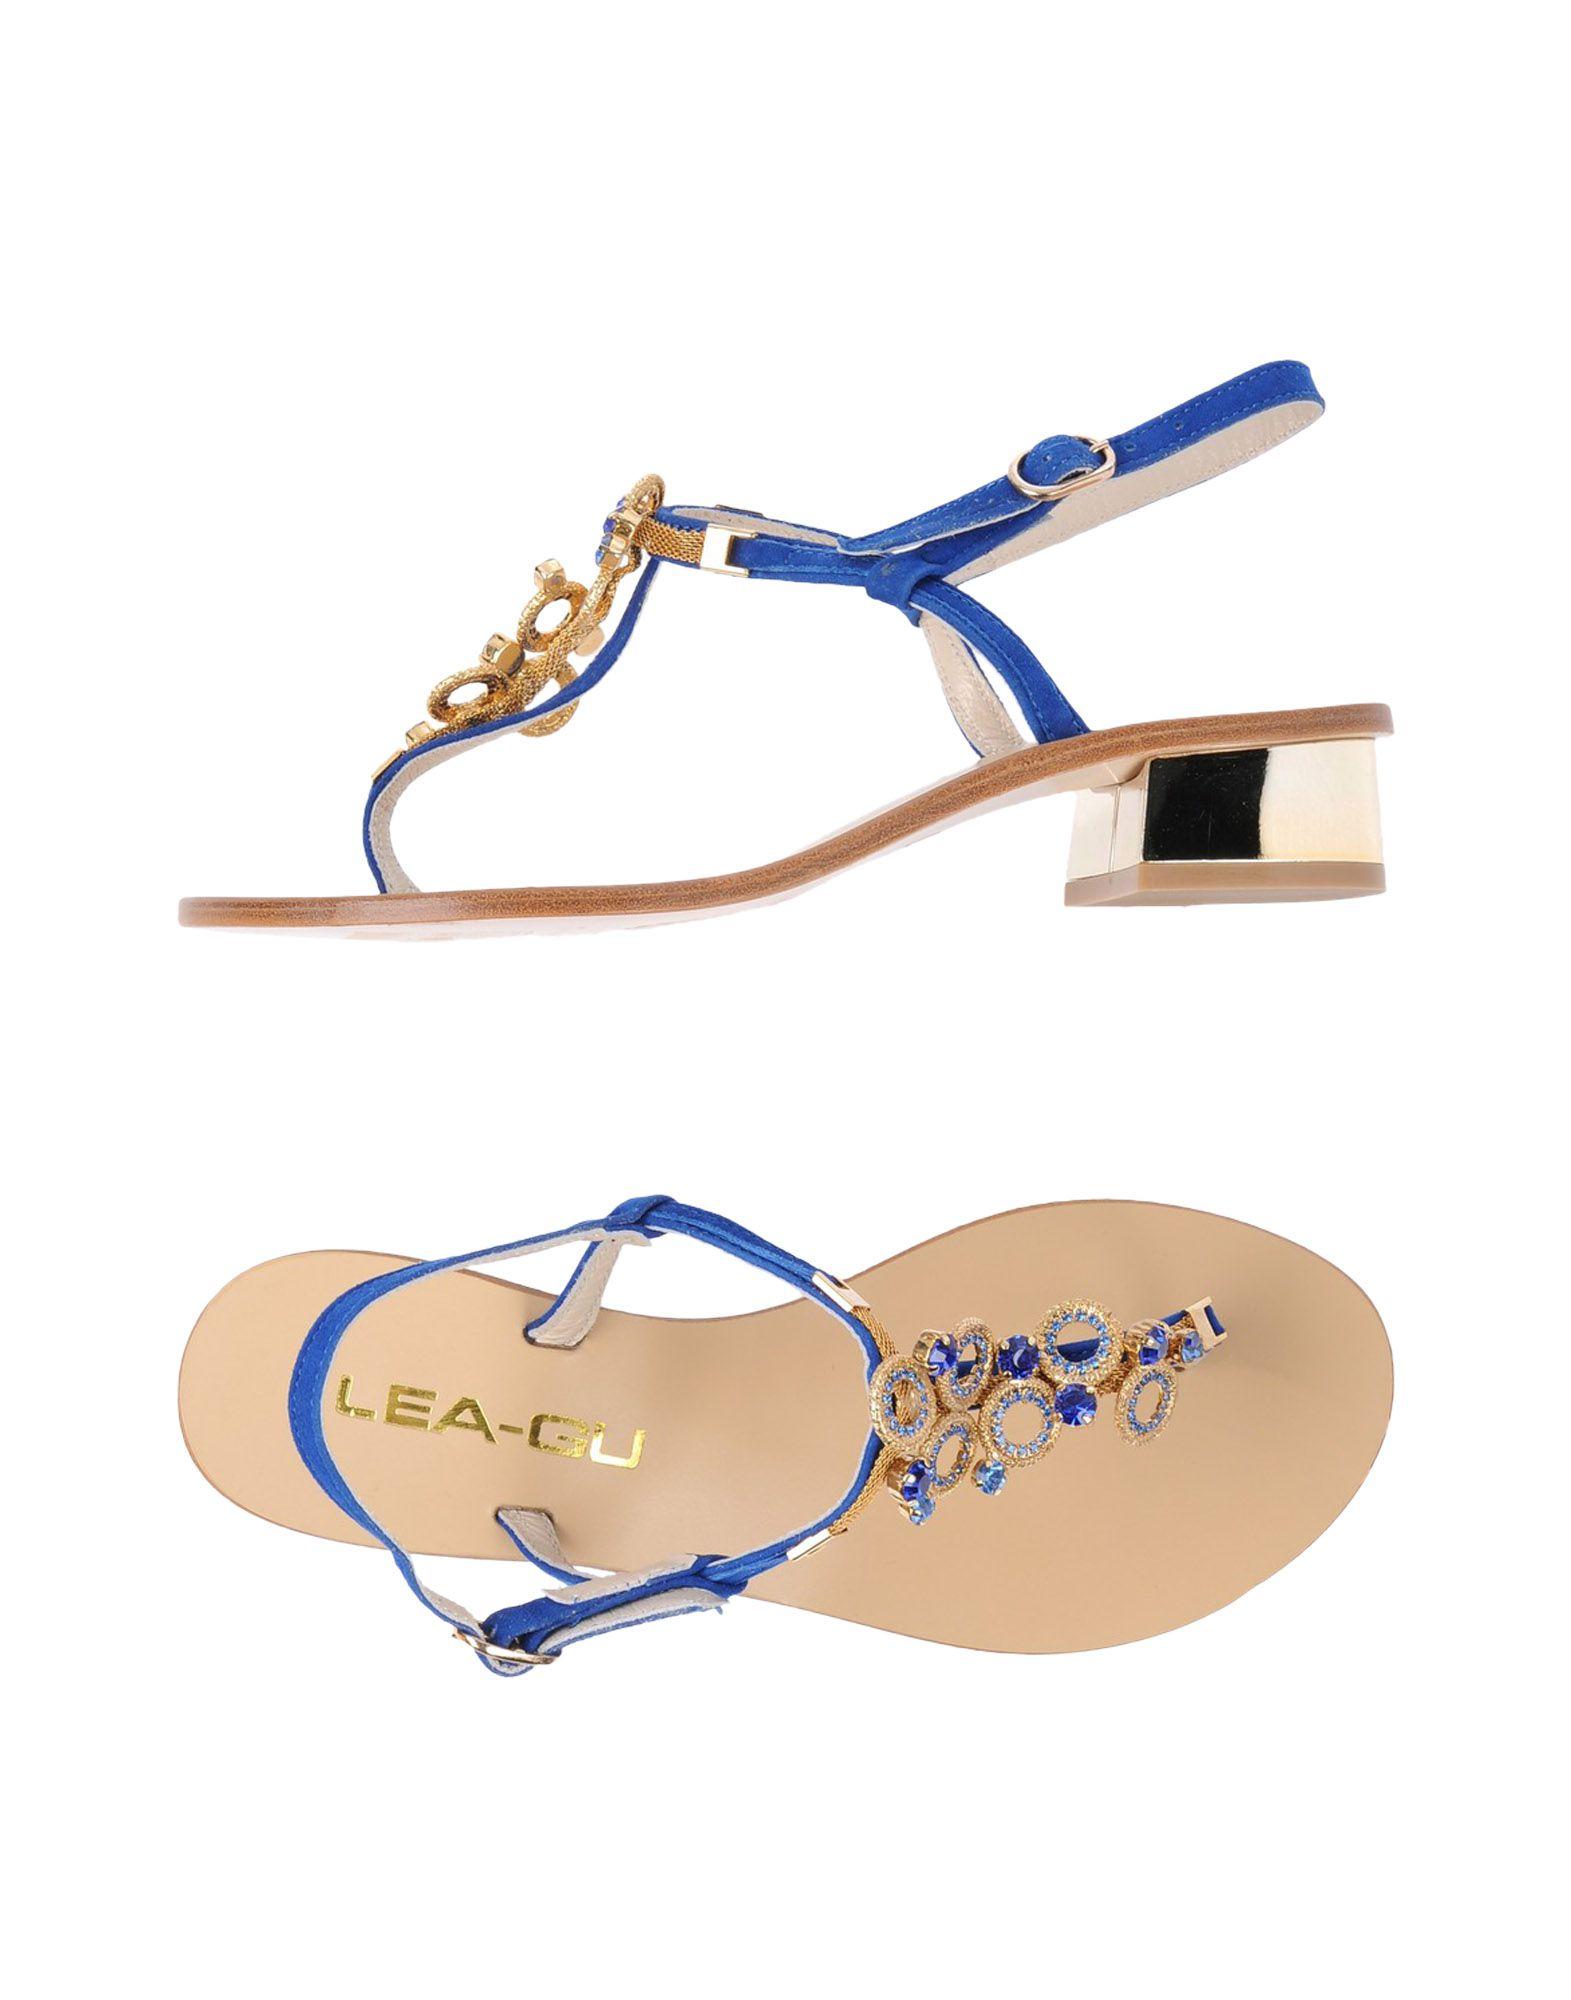 Lea 11472471XGGut aussehende strapazierfähige Schuhe